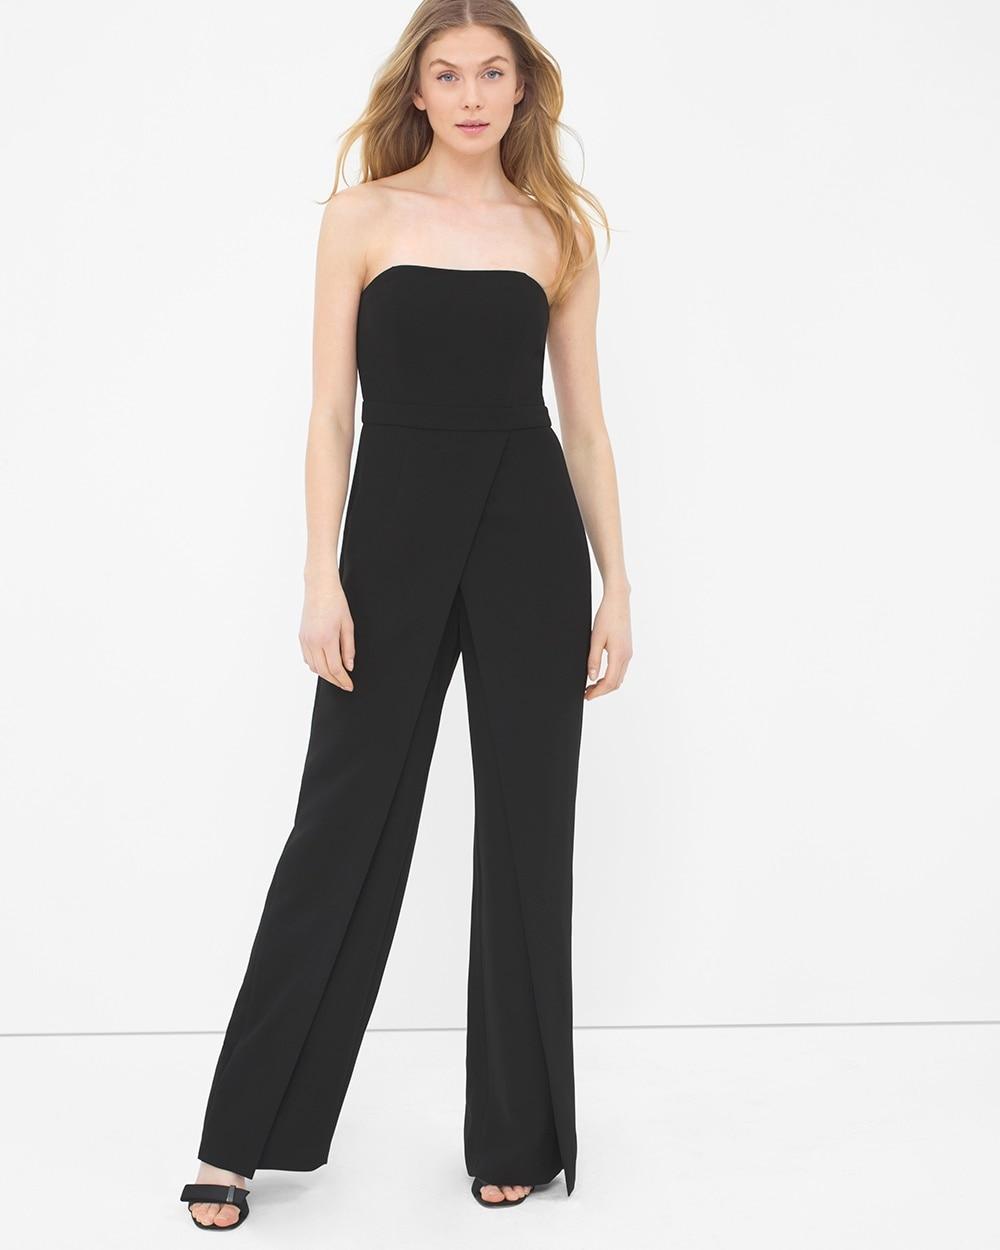 Convertible Black Strapless Split Pant Jumpsuit White House Black